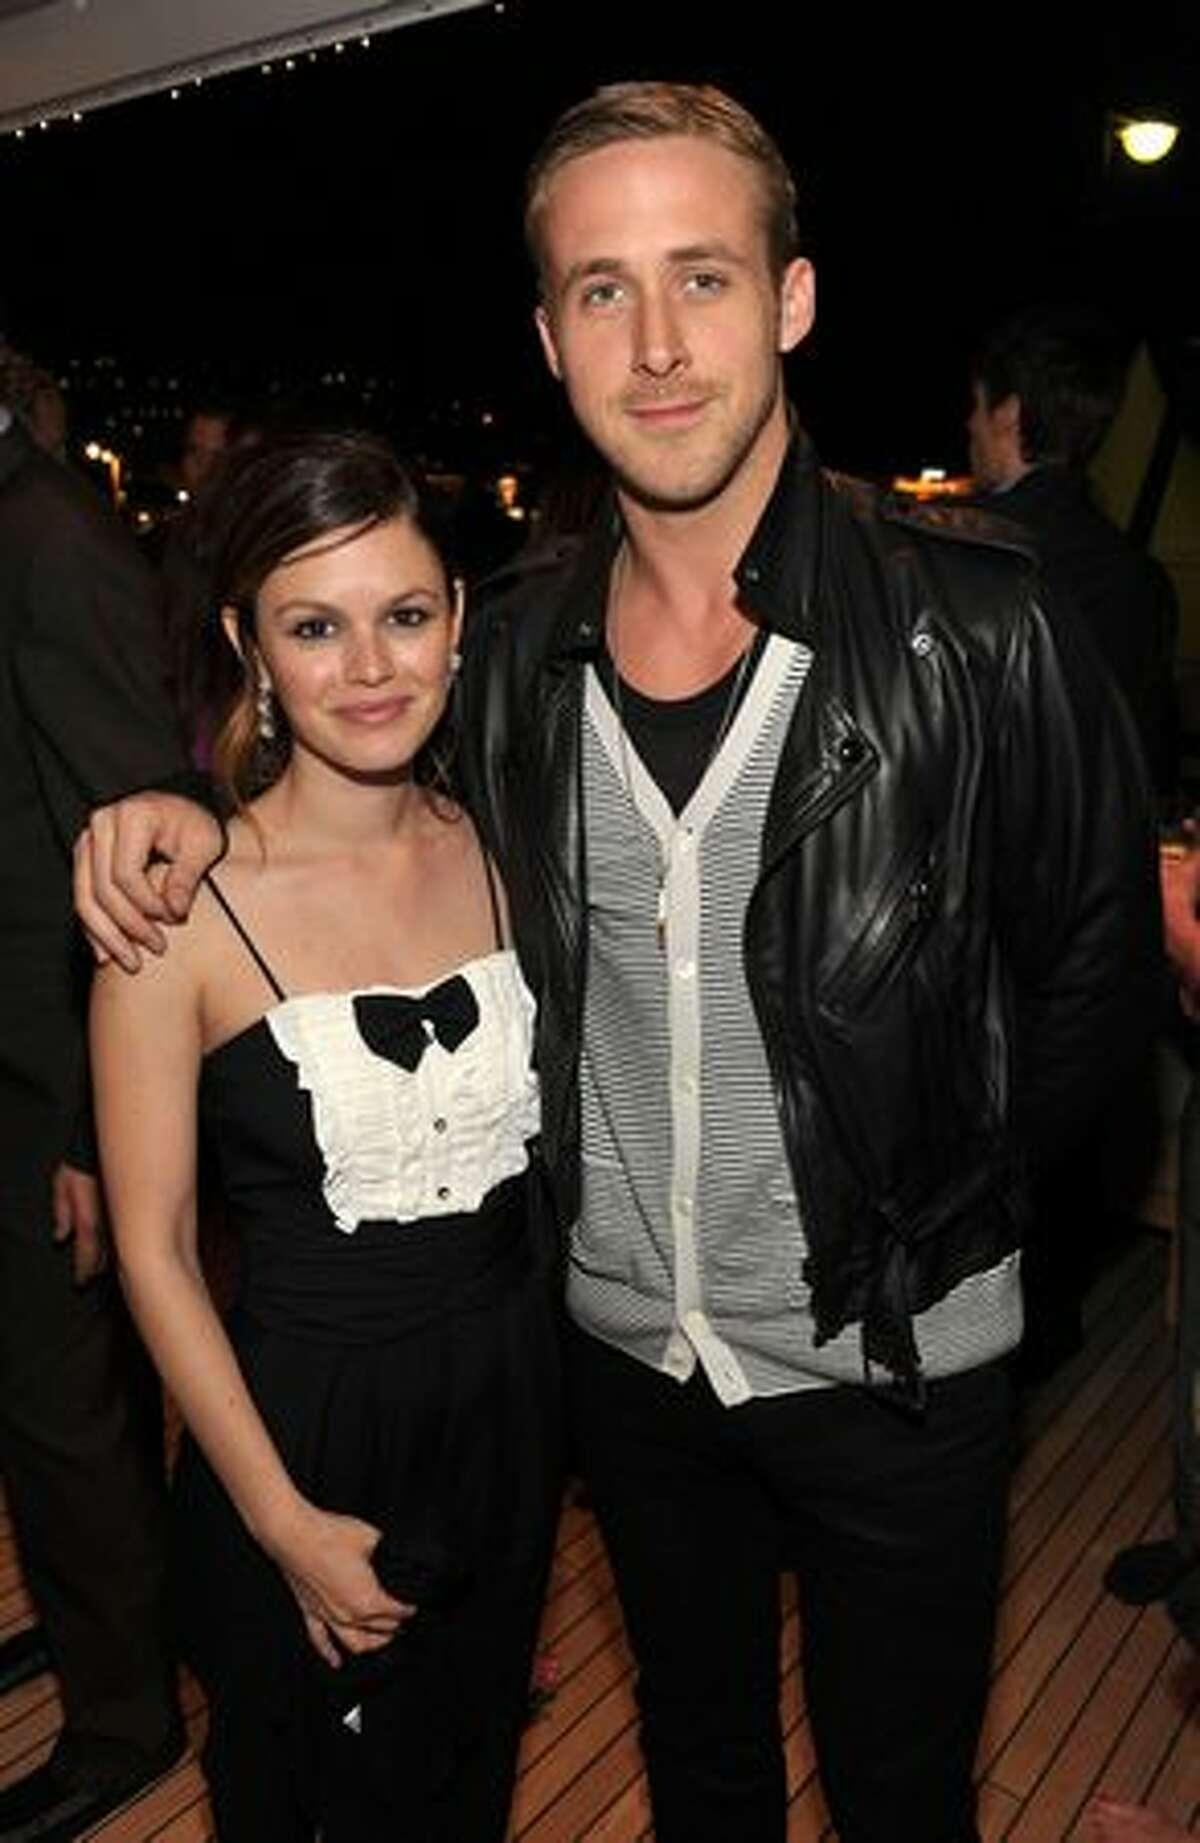 Actors Rachel Bilson and Ryan Gosling attend the